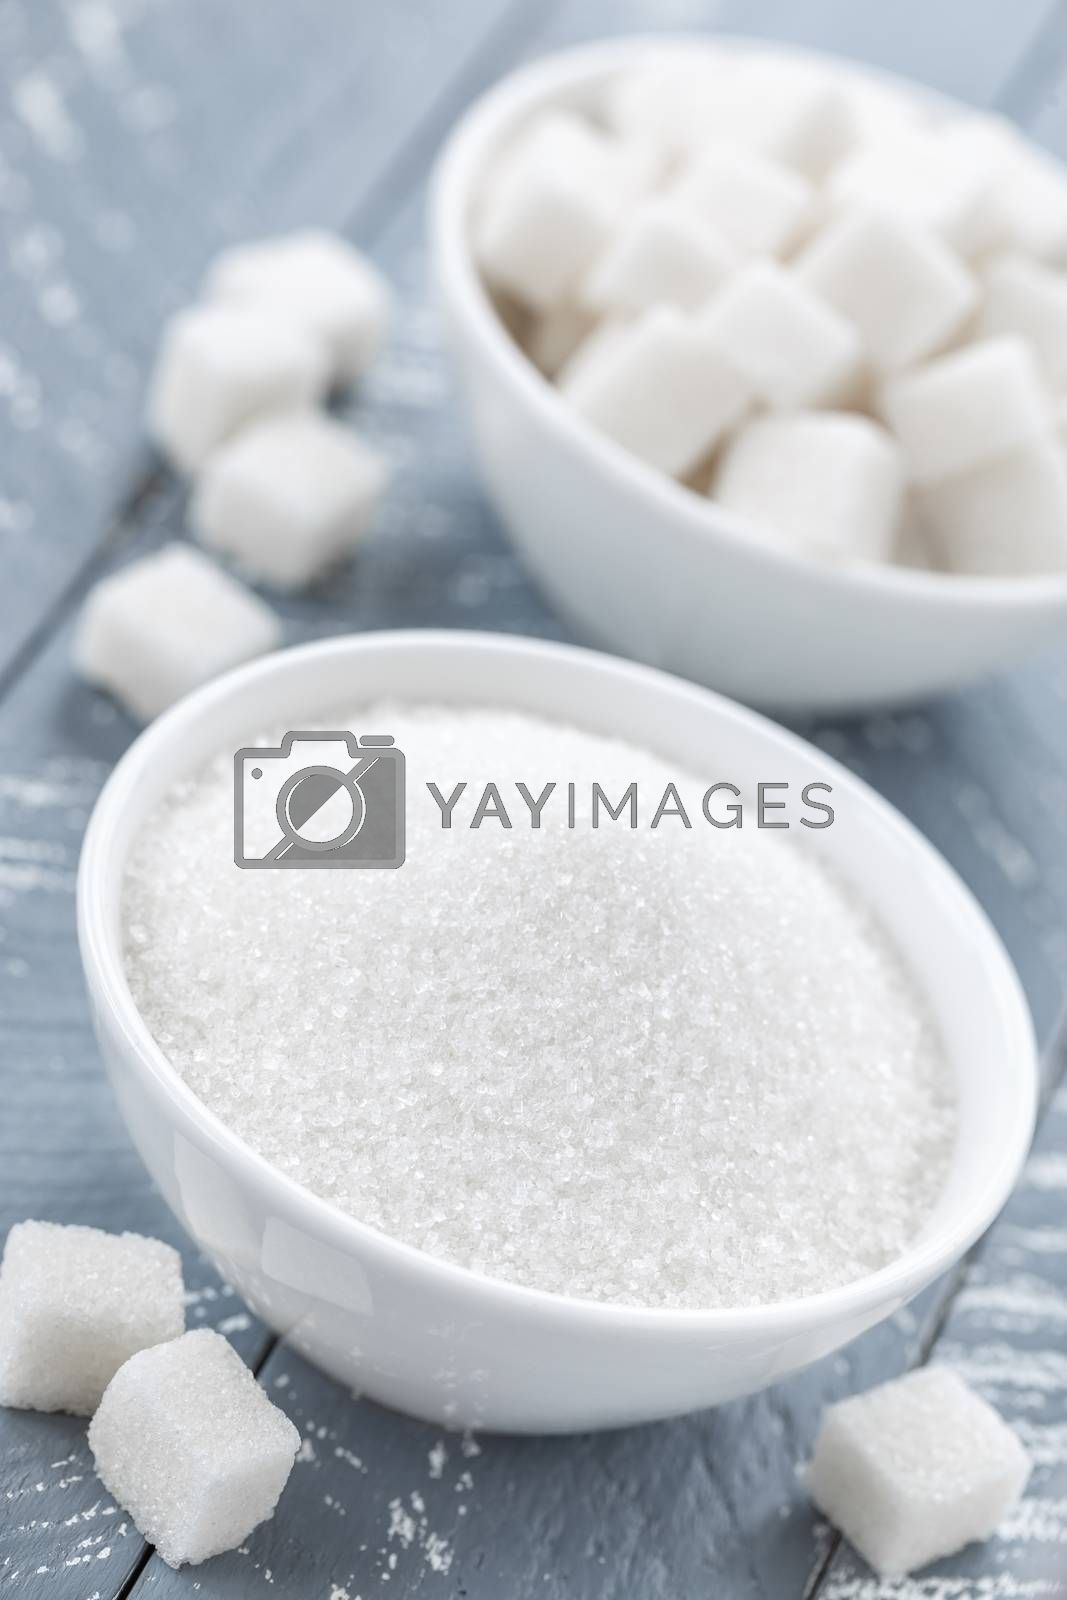 Royalty free image of Sugar by yelenayemchuk